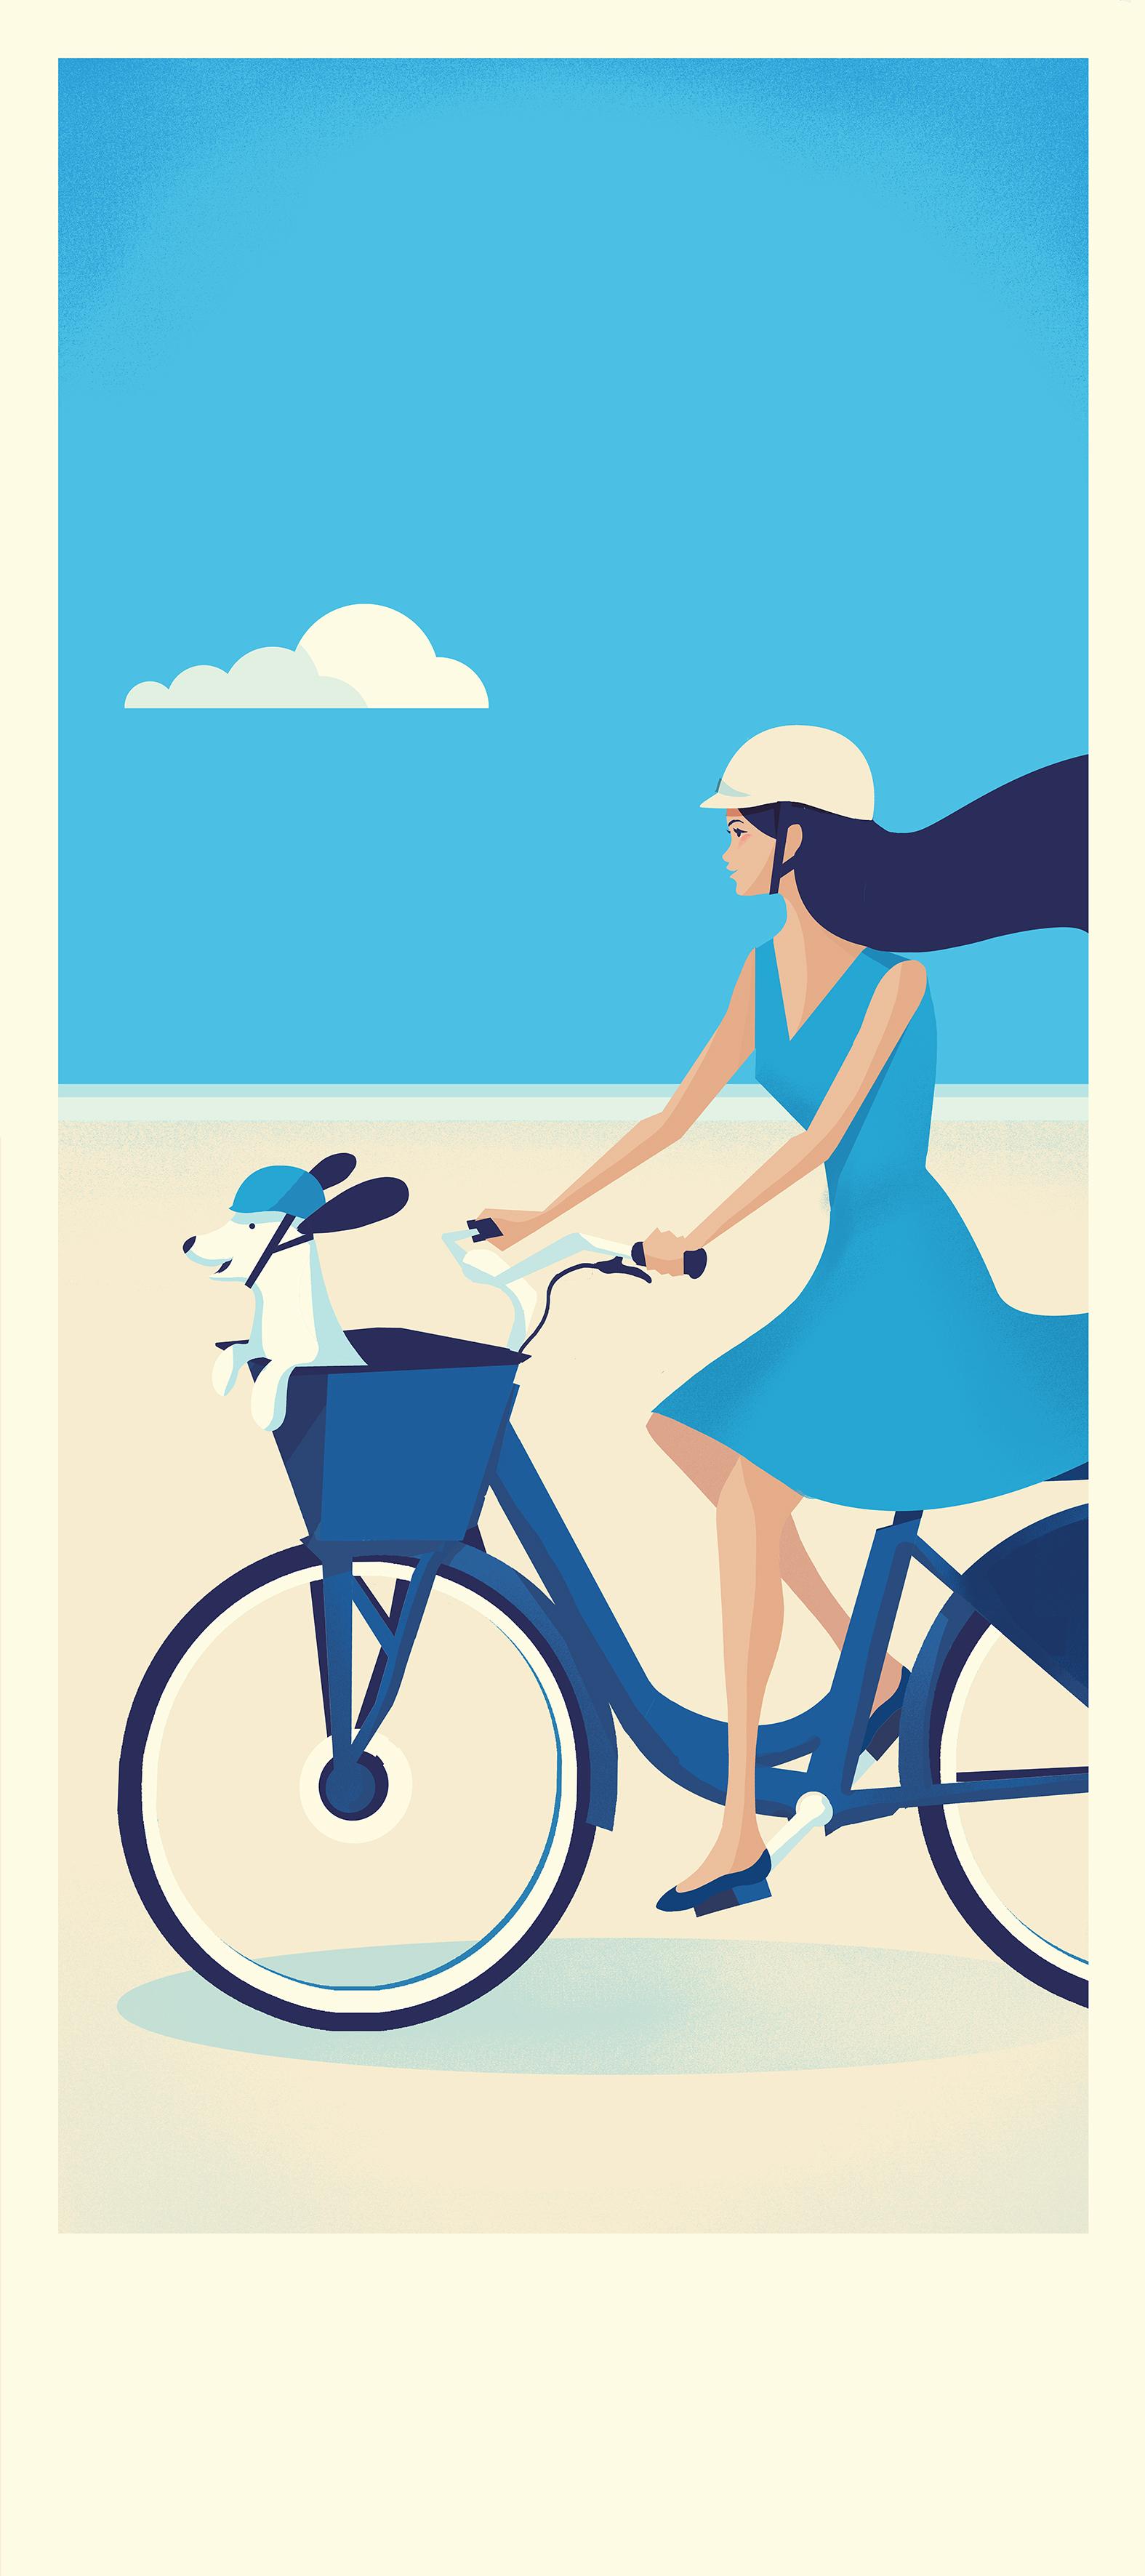 Citi Bike Miami >> Citi Bike Miami By Pietari Posti Agent Pekka